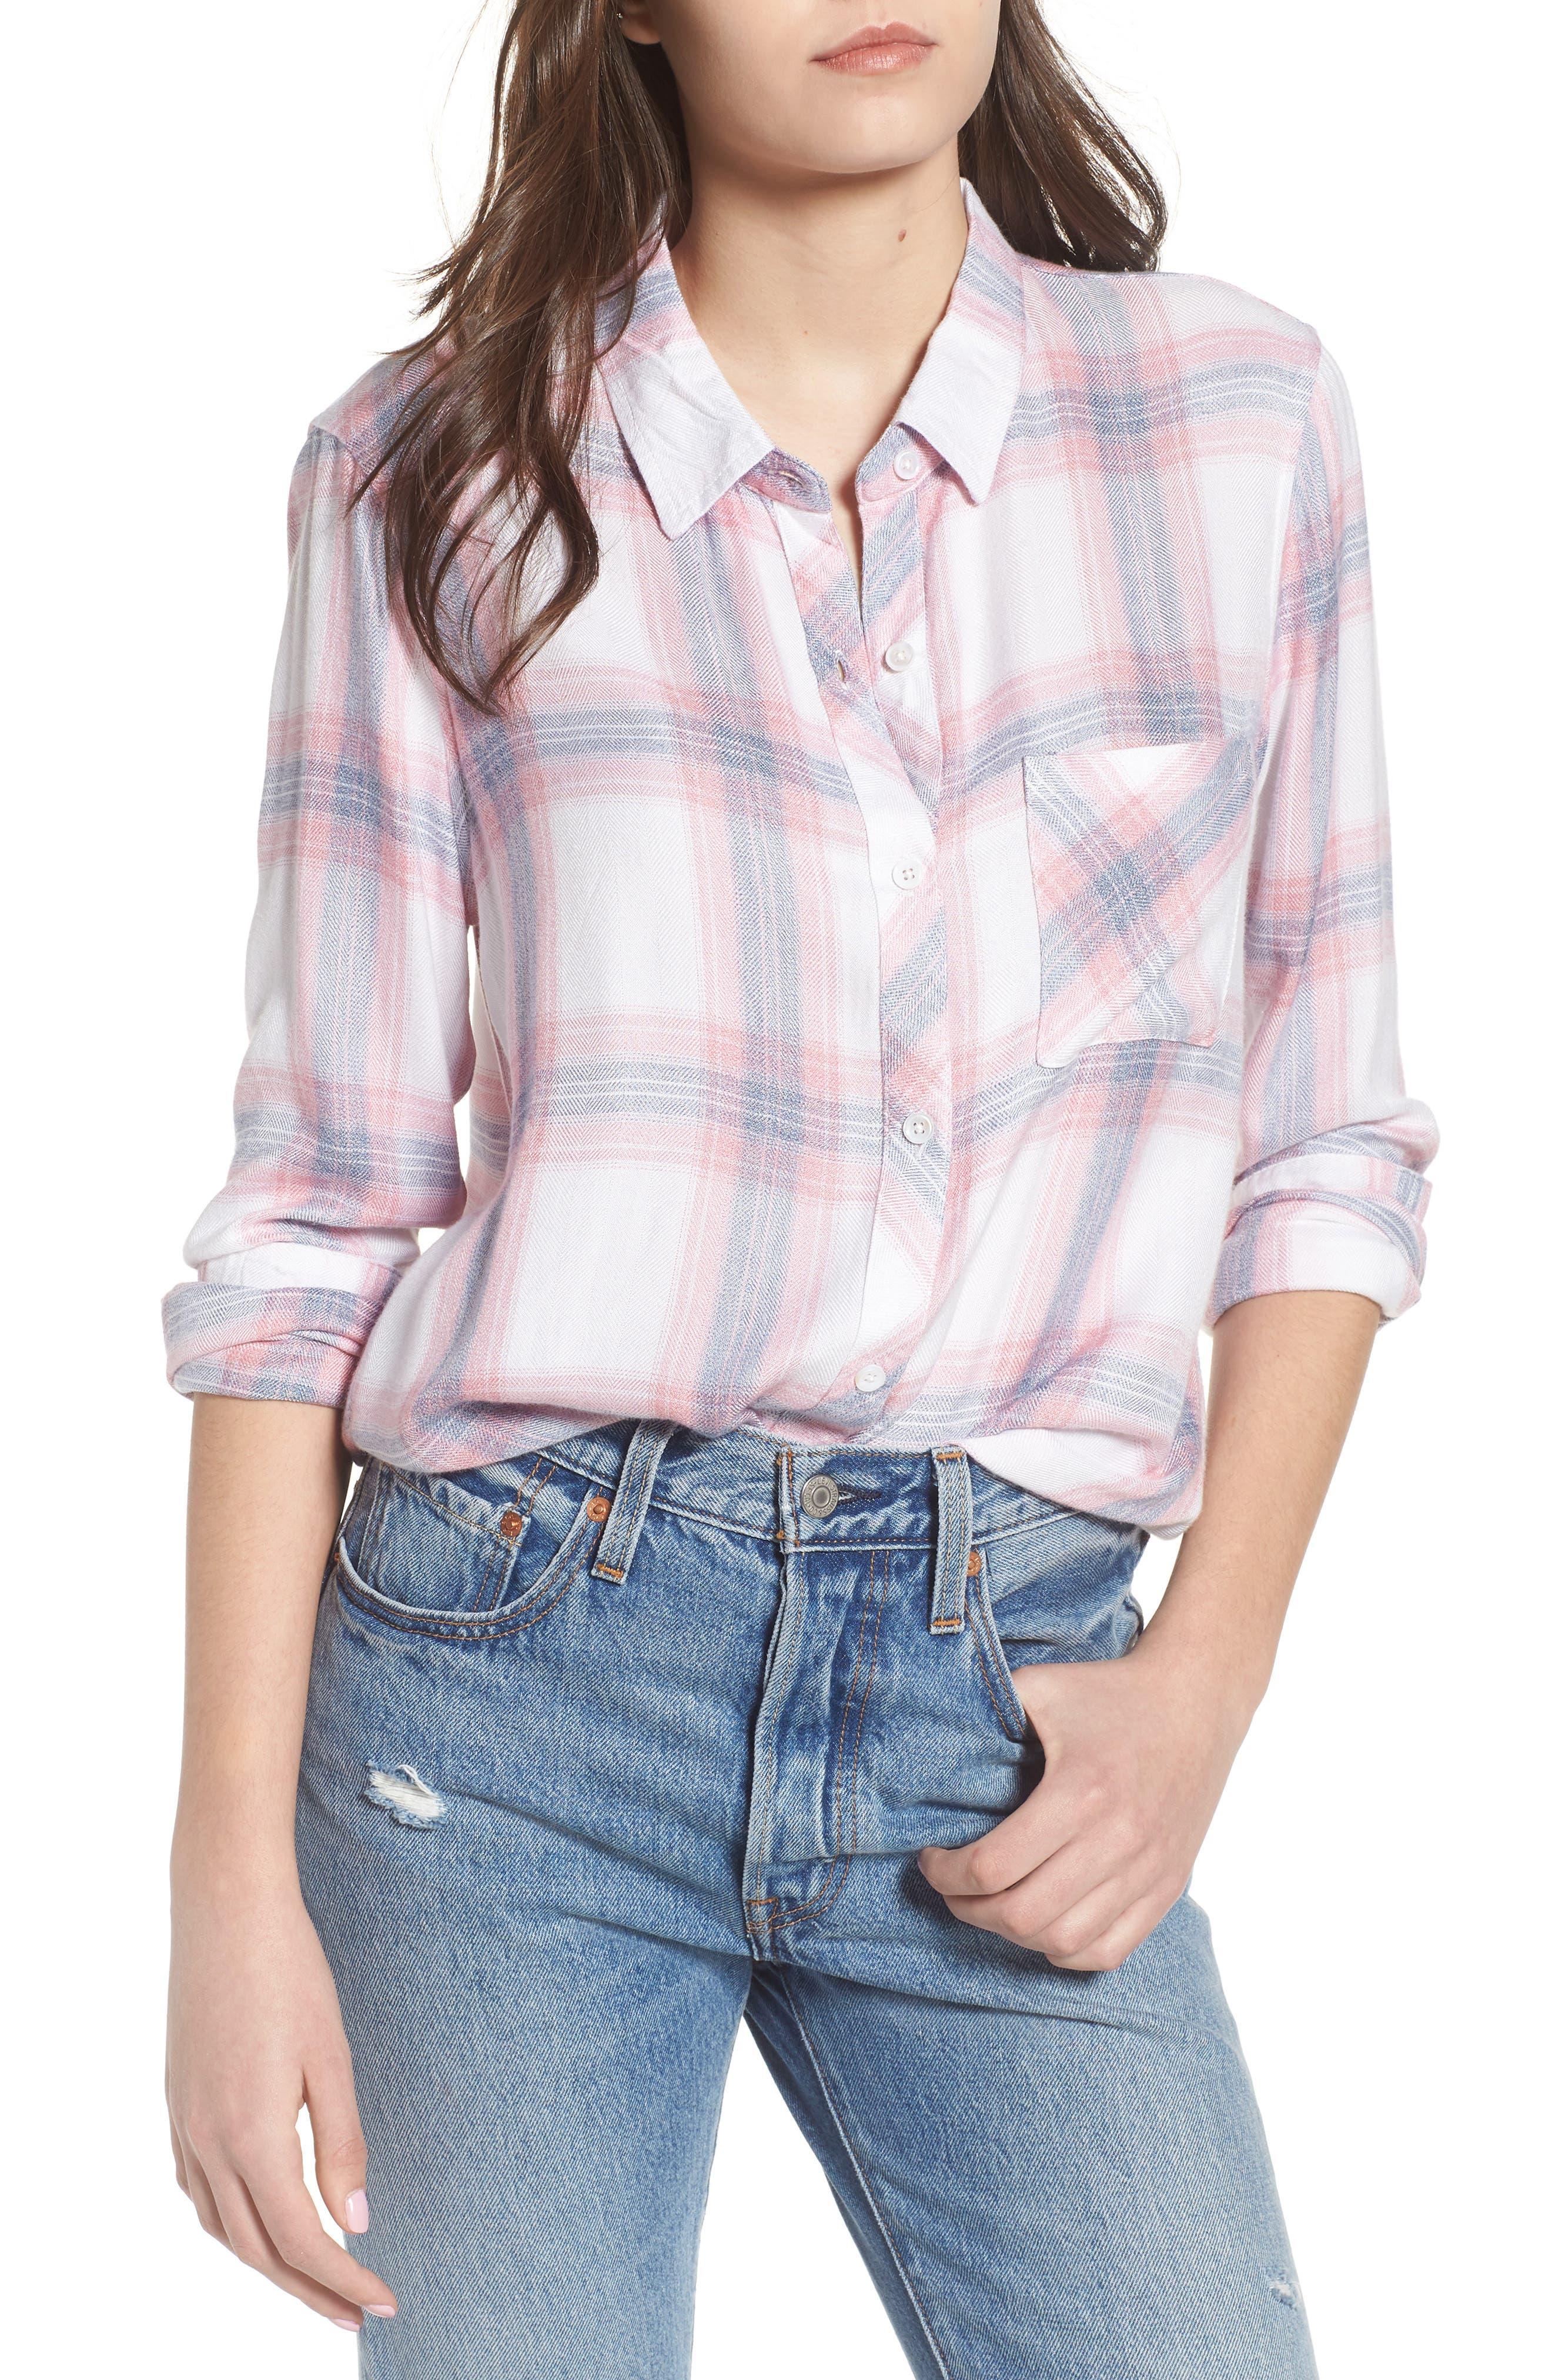 Carina Plaid Shirt,                             Main thumbnail 1, color,                             Red/ White Plaid